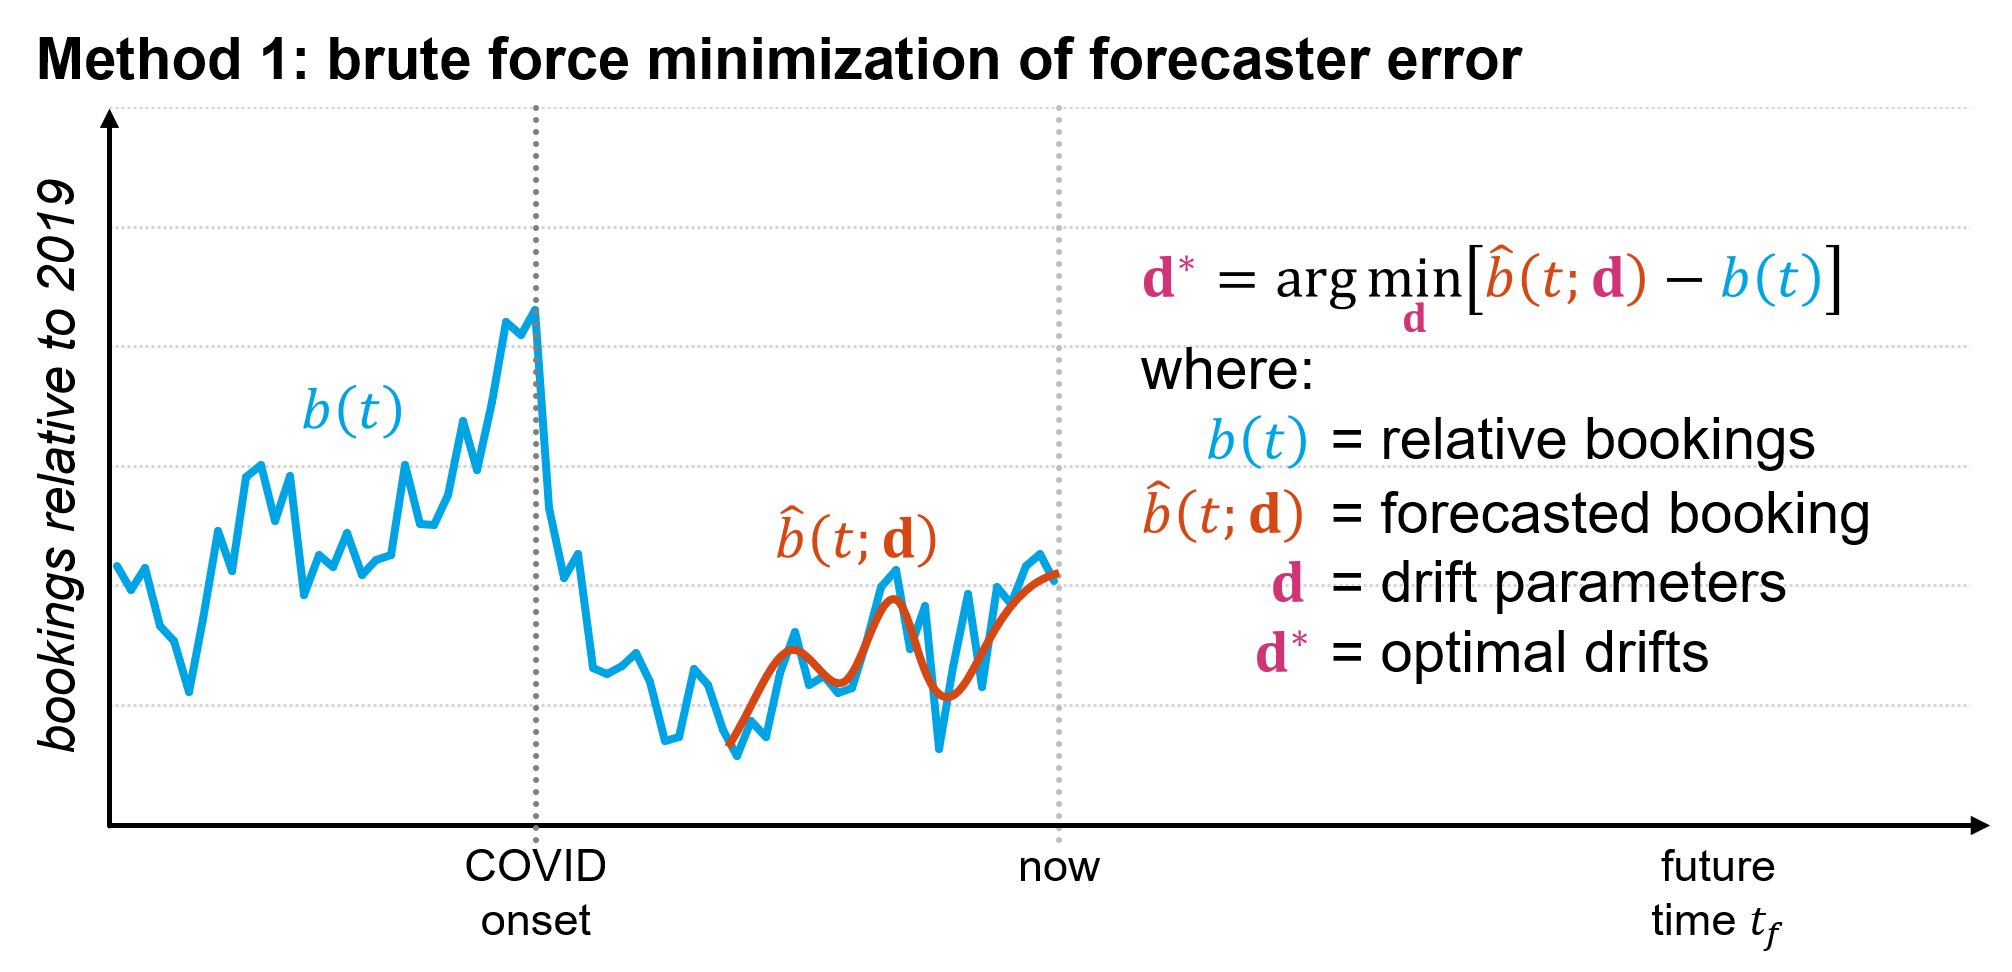 Brute force minimization of forecaster error